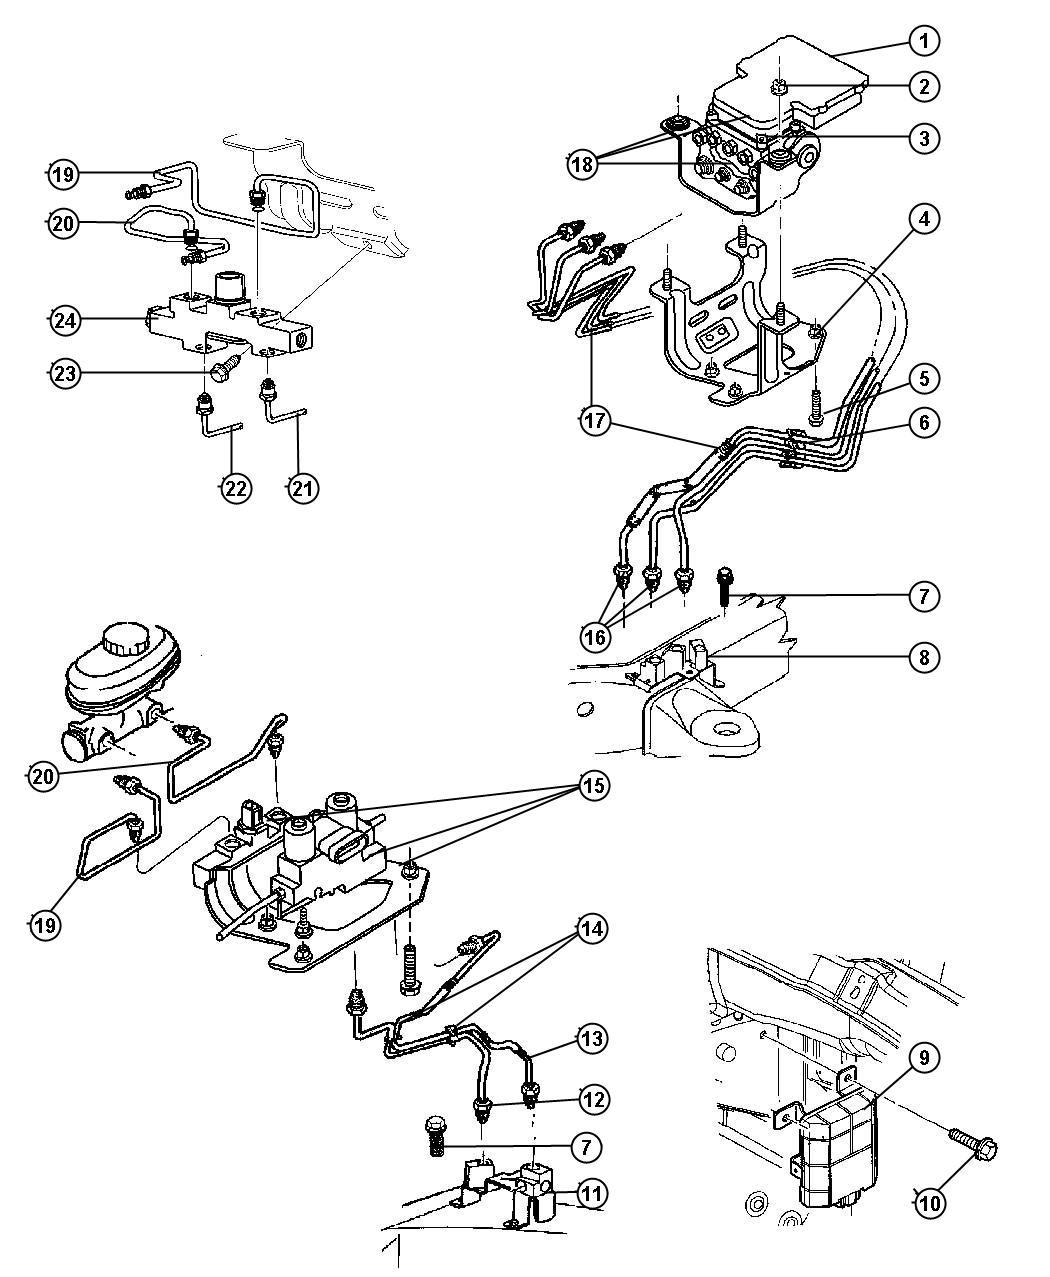 Dodge Ram 1500 Module  Anti-lock Brakes   4-wheel Anti-lock Brakes